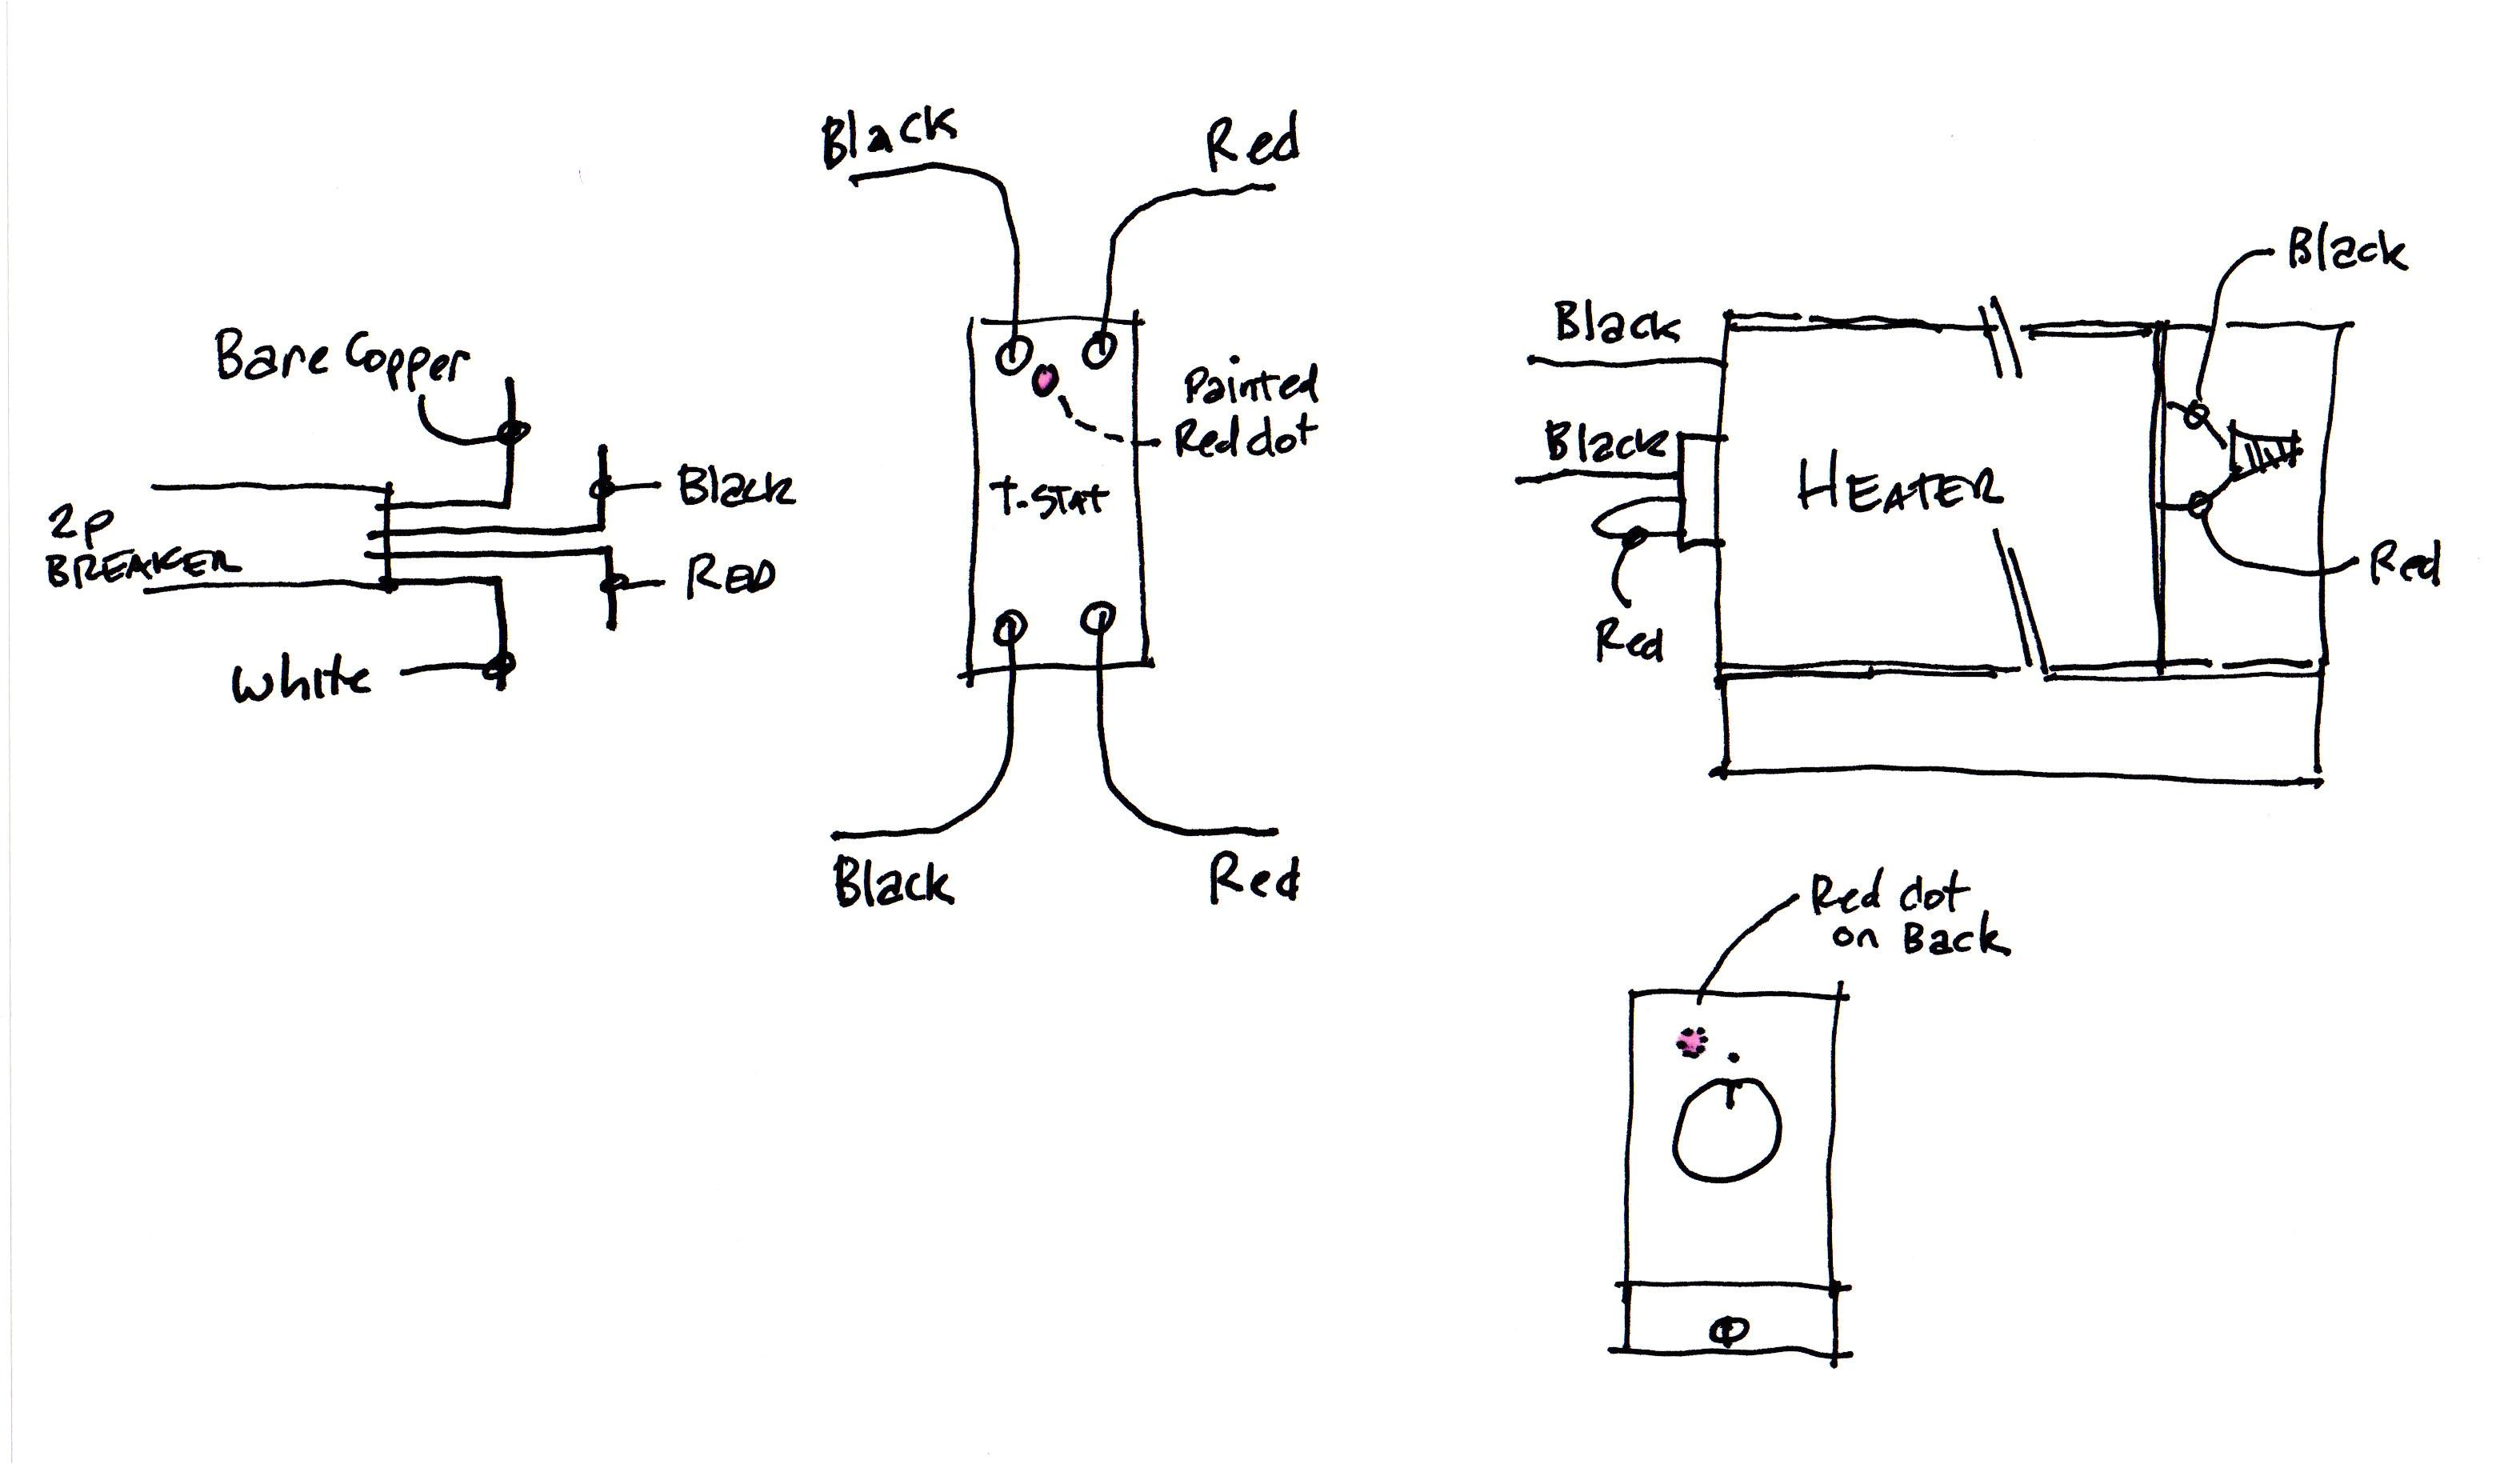 ta2awc thermostat wiring diagram wiring diagram table marley pump wiring diagram